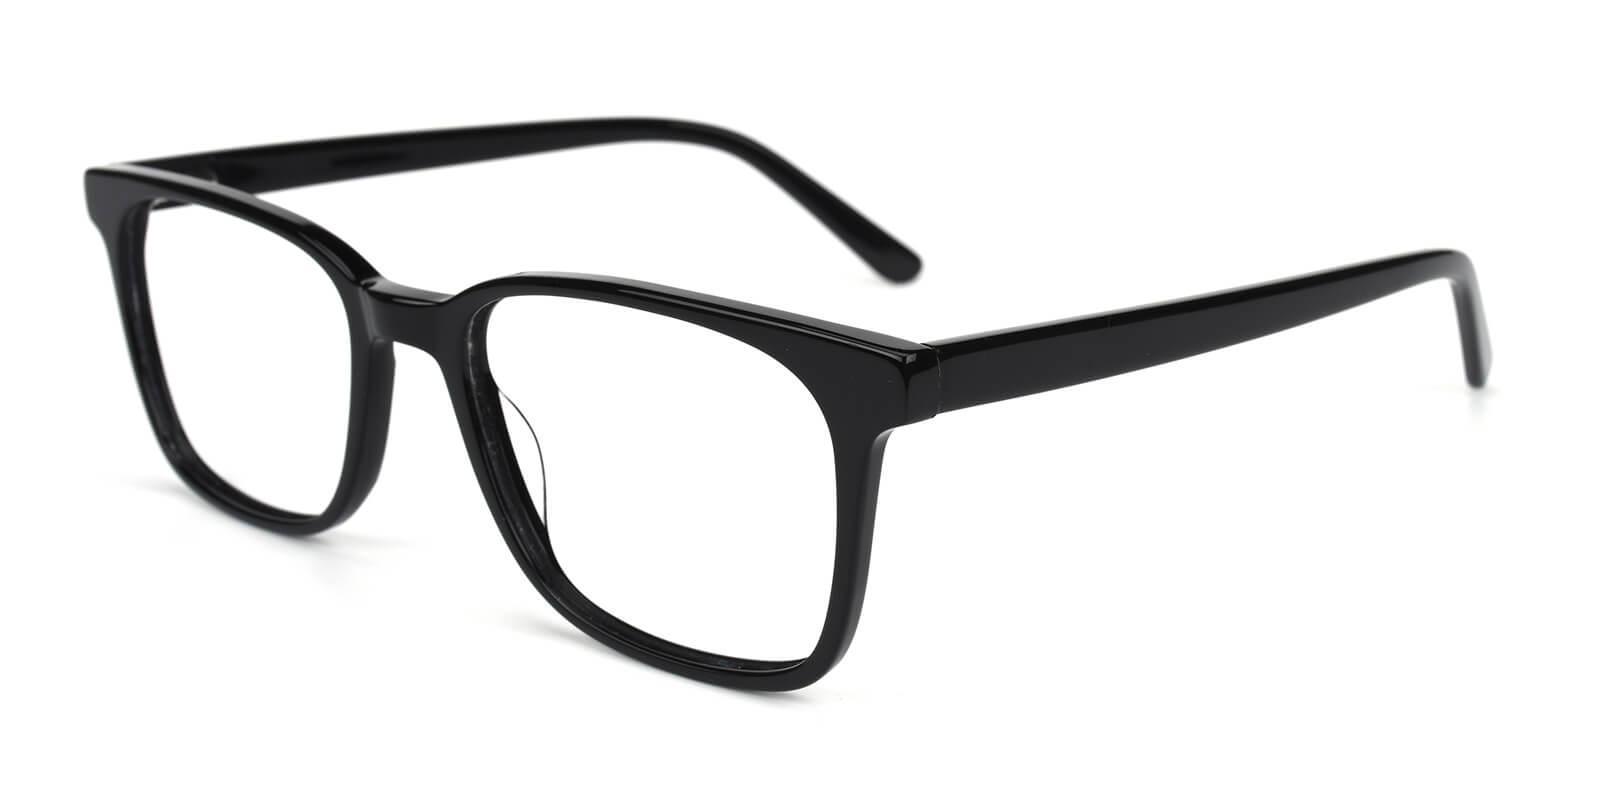 Kattan-Black-Square-Acetate-Eyeglasses-additional1